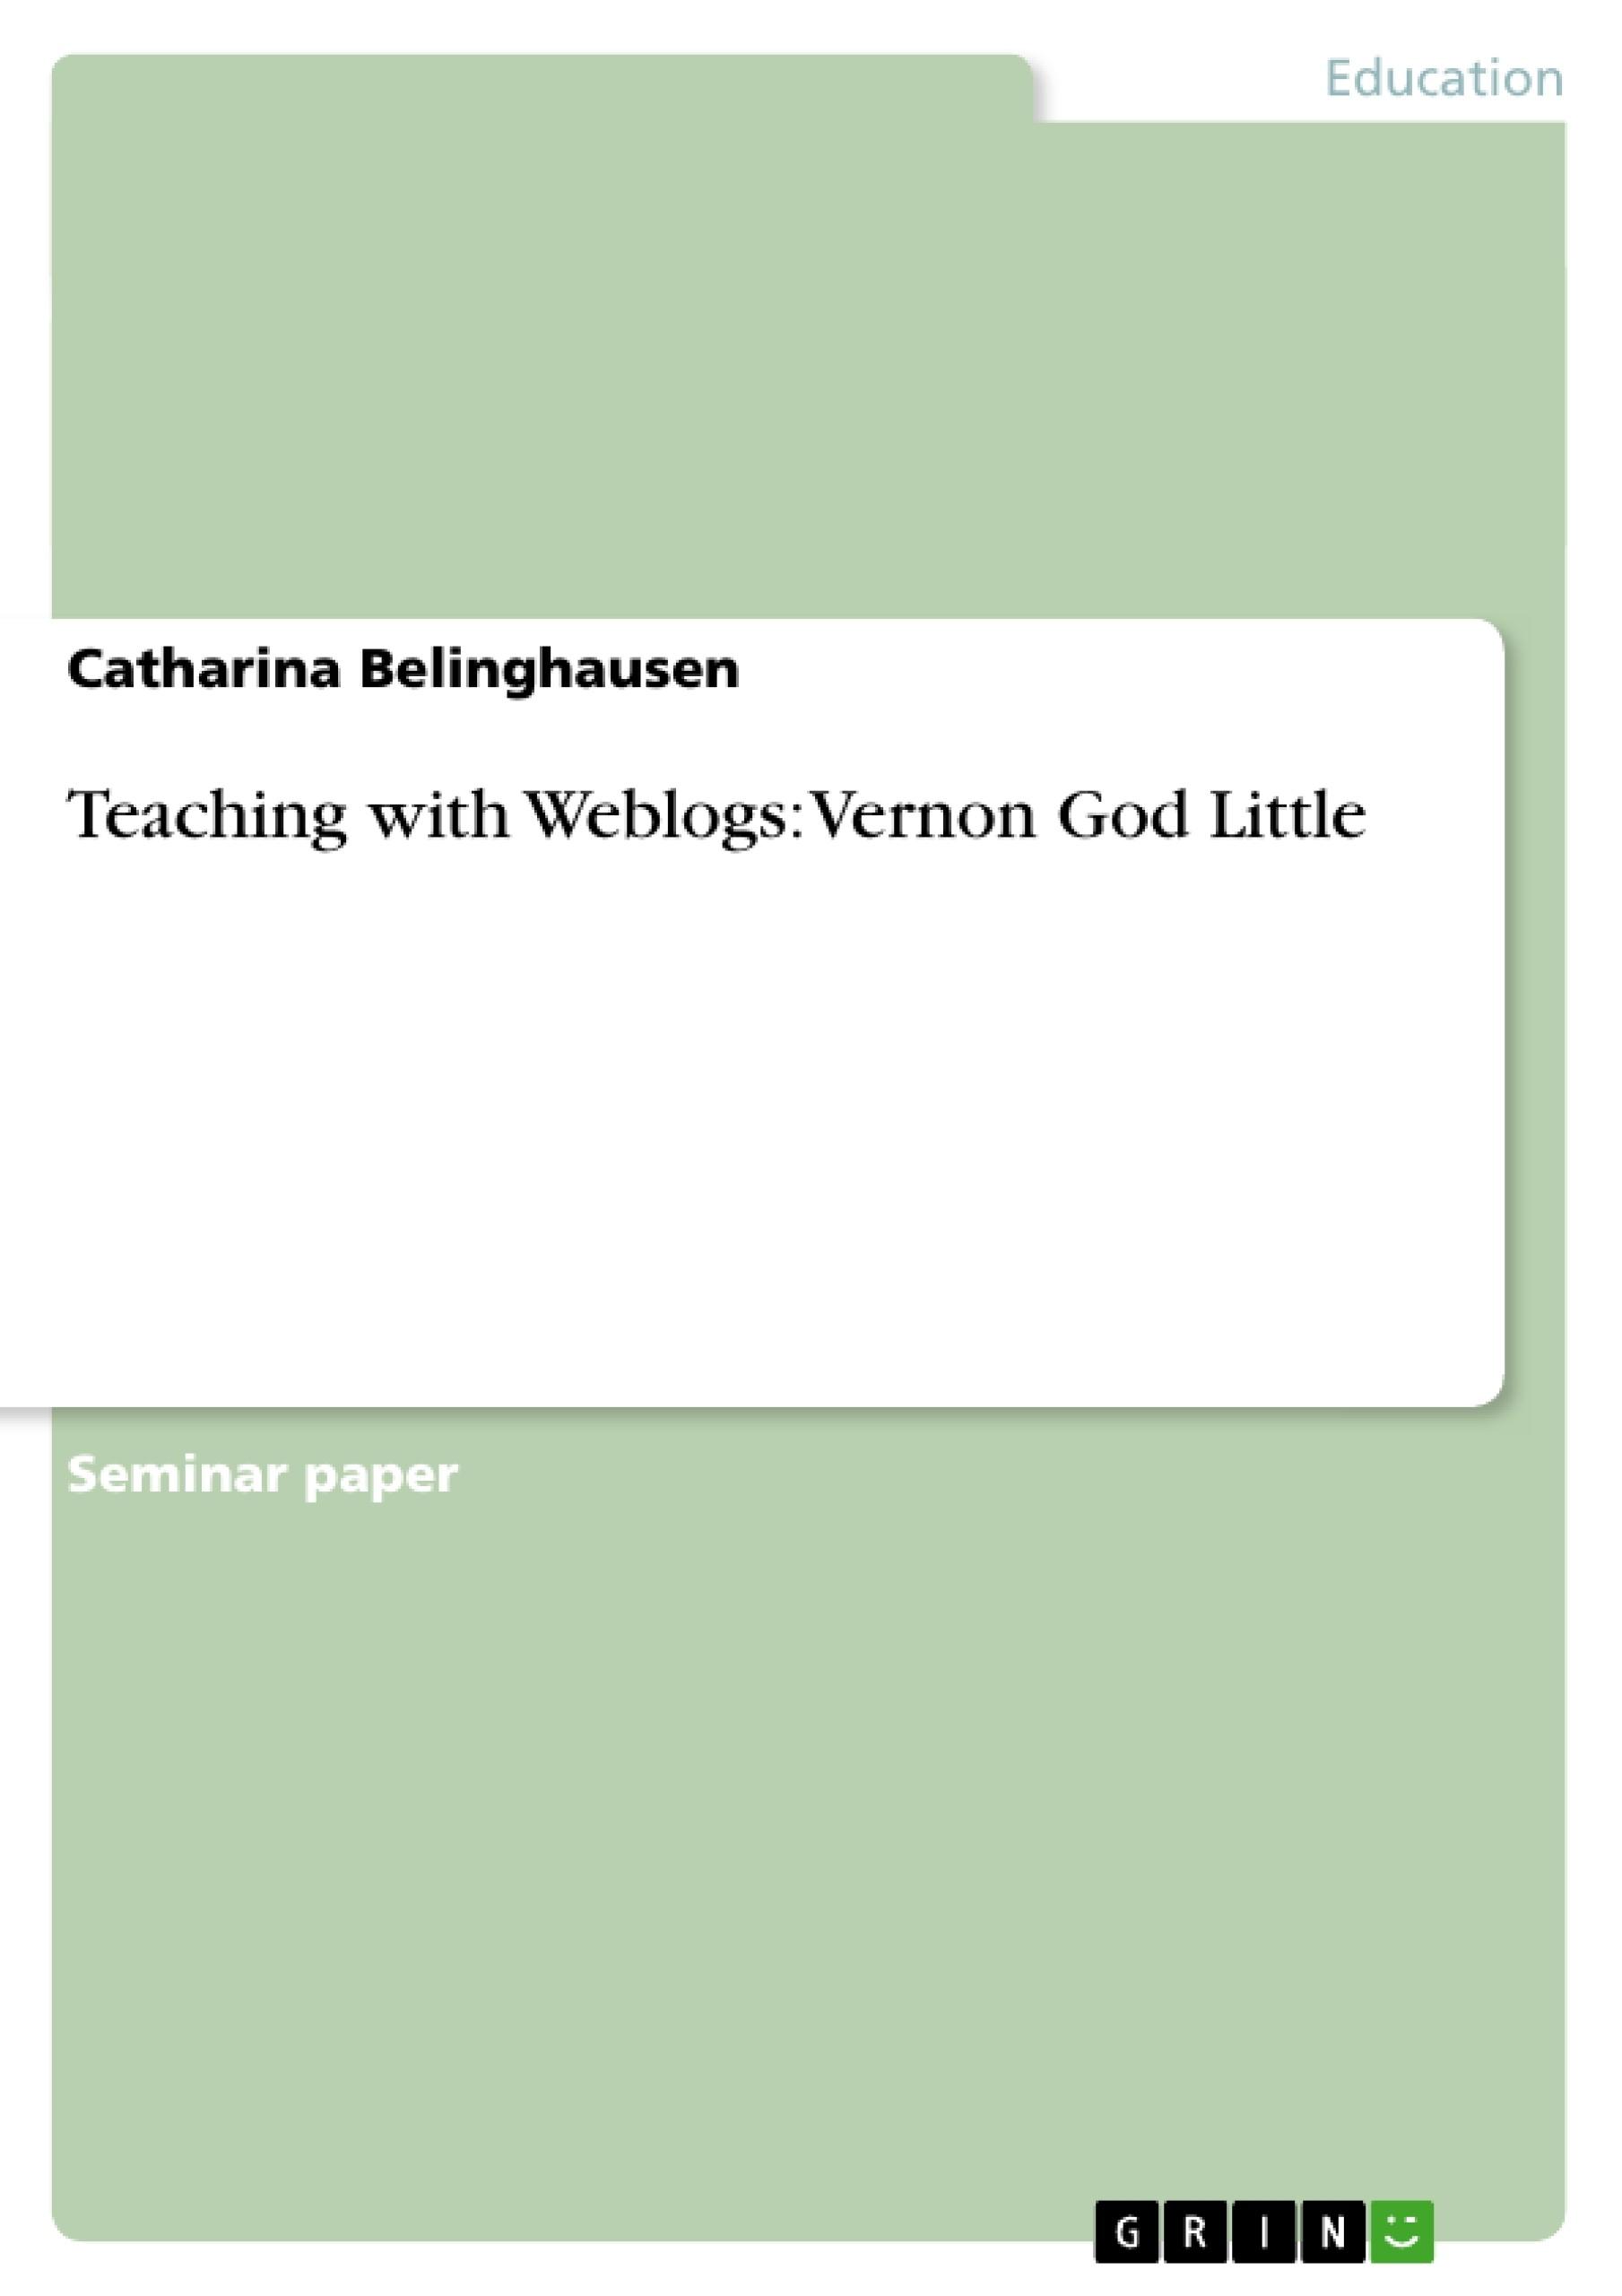 Title: Teaching with Weblogs: Vernon God Little